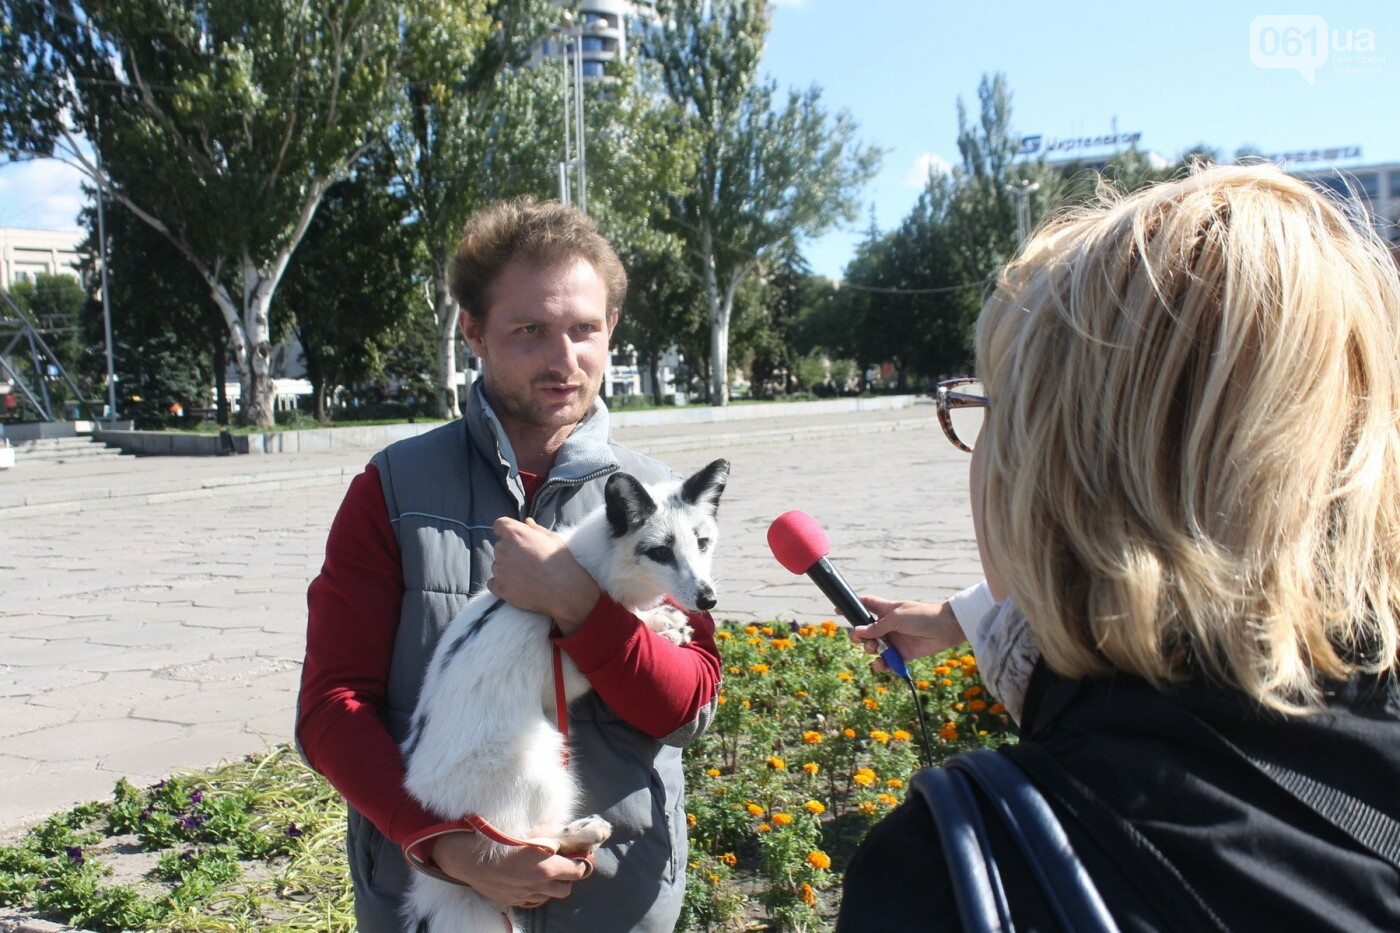 «Защити! Не мучай»: в Запорожье провели марш за права животных, – ФОТОРЕПОРТАЖ, ВИДЕО, фото-2